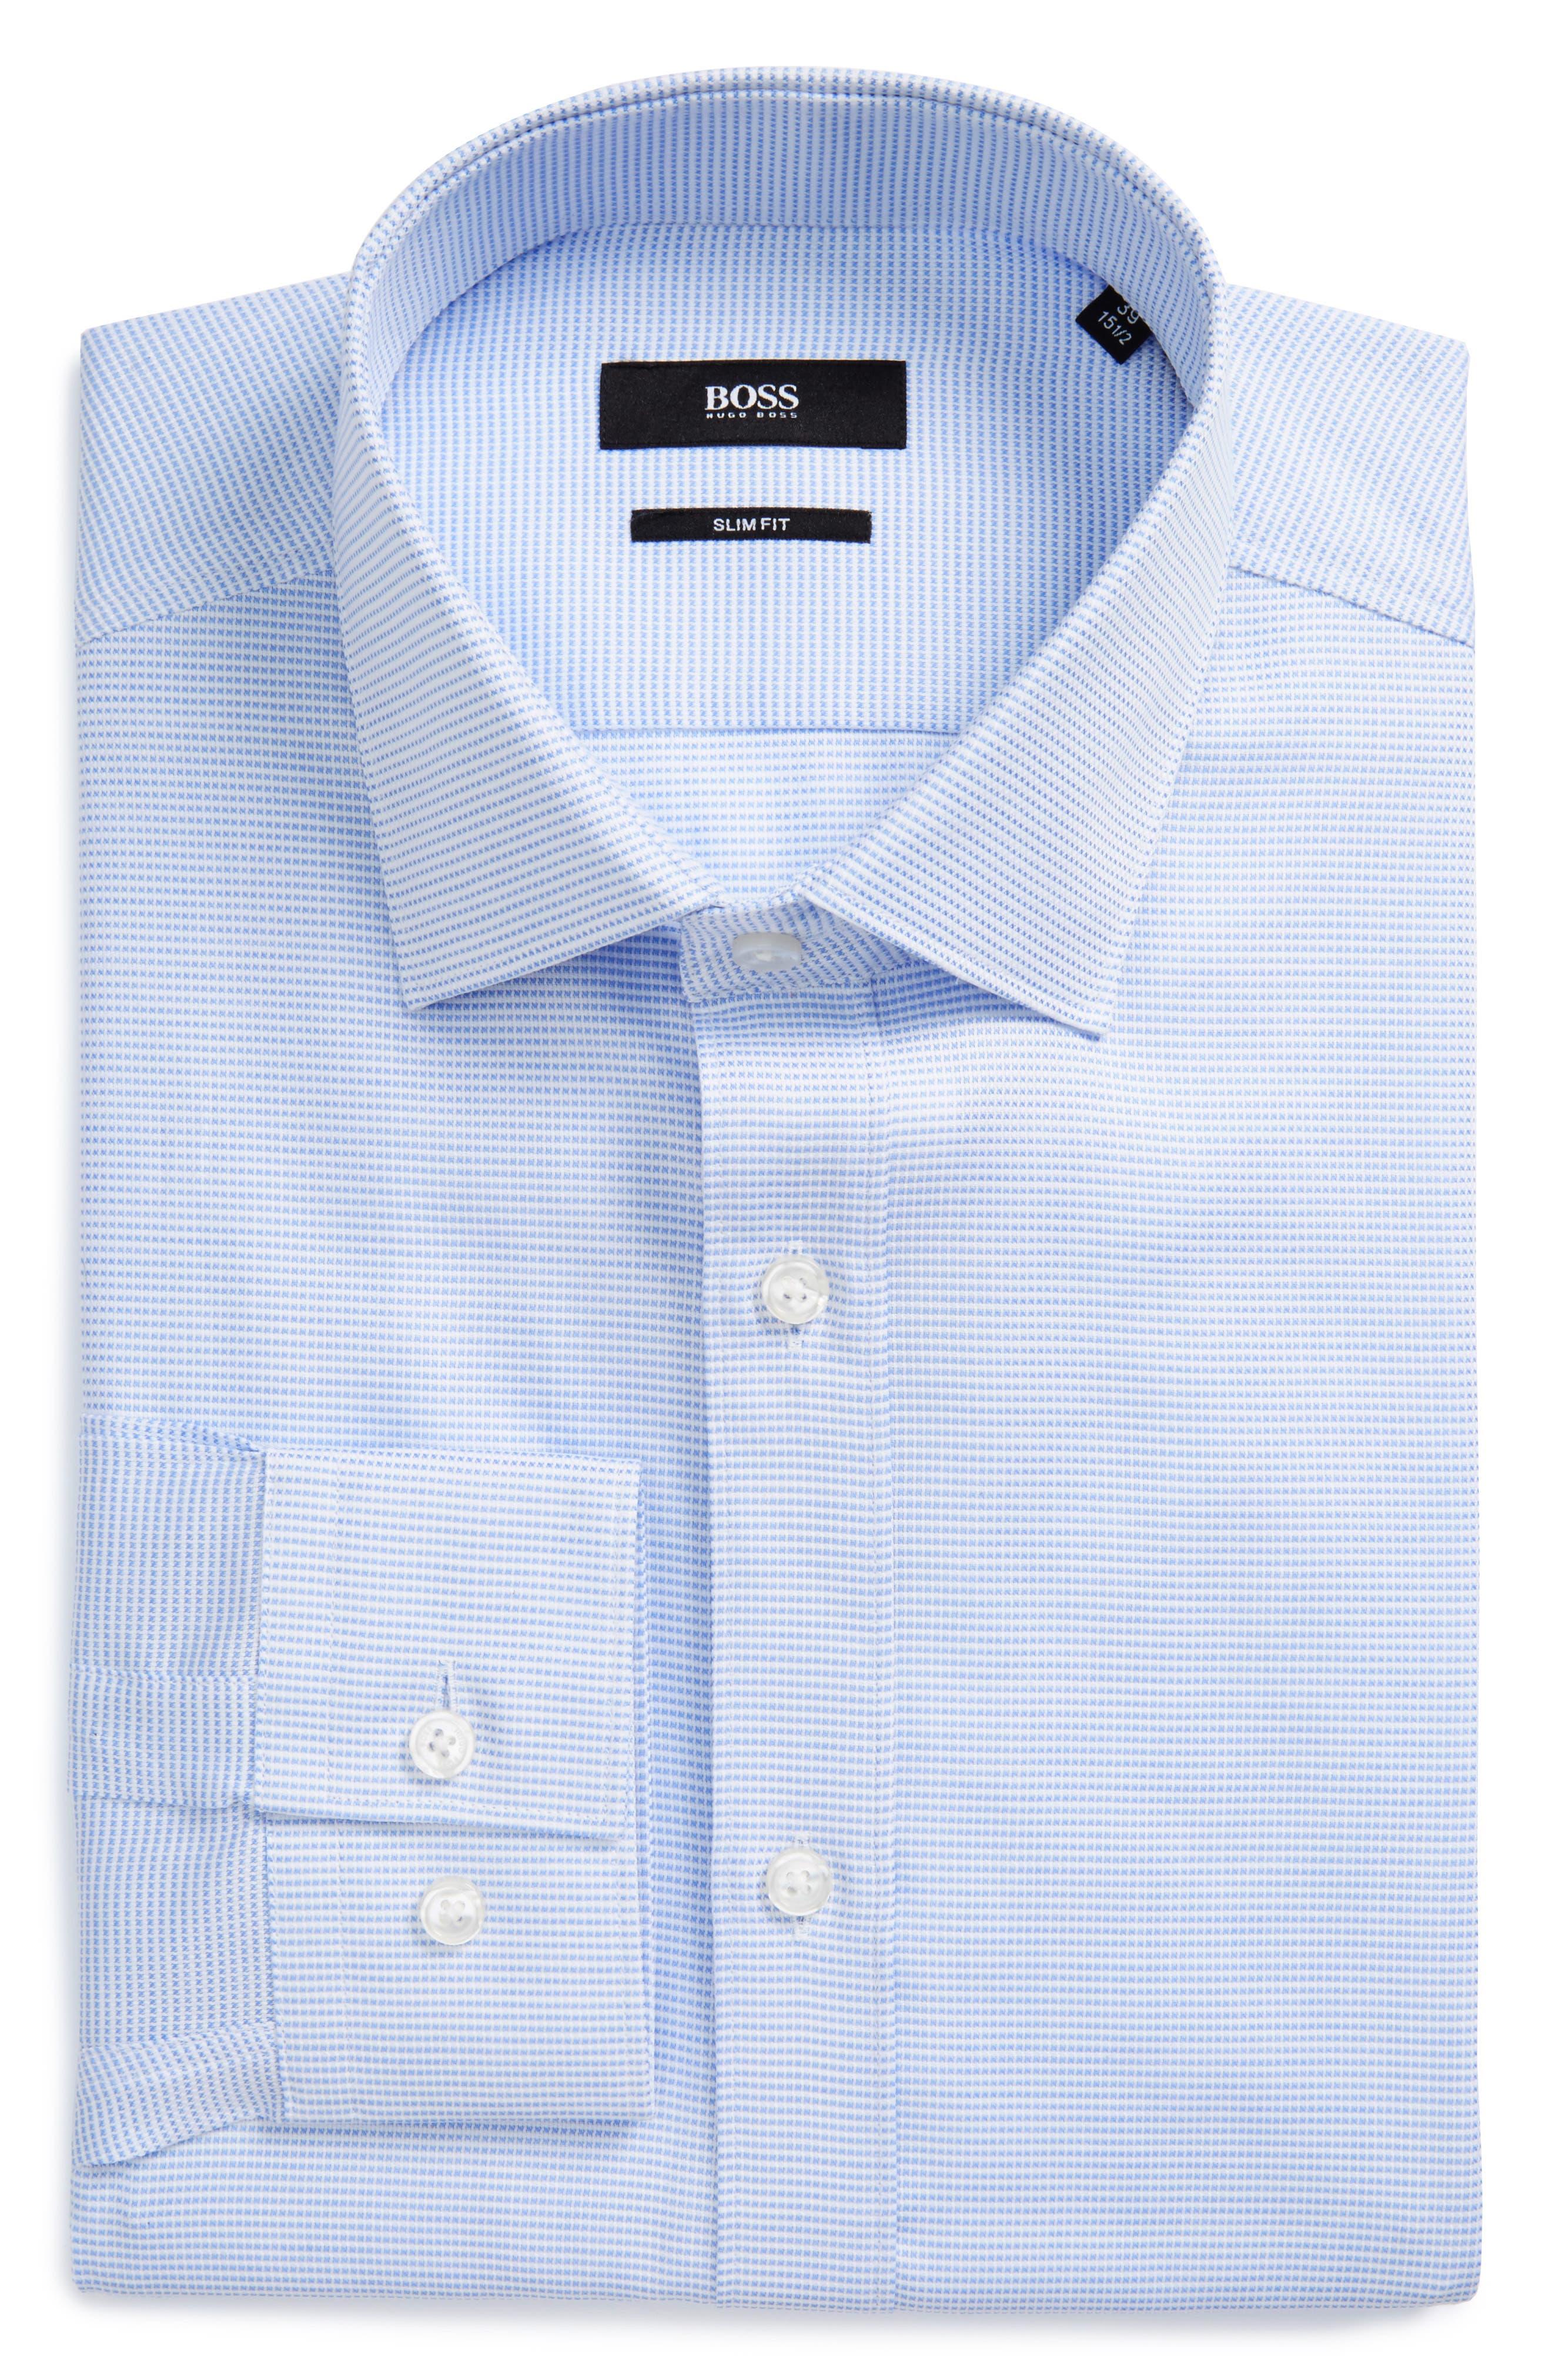 Alternate Image 1 Selected - BOSS Issak Slim Fit Check Dress Shirt